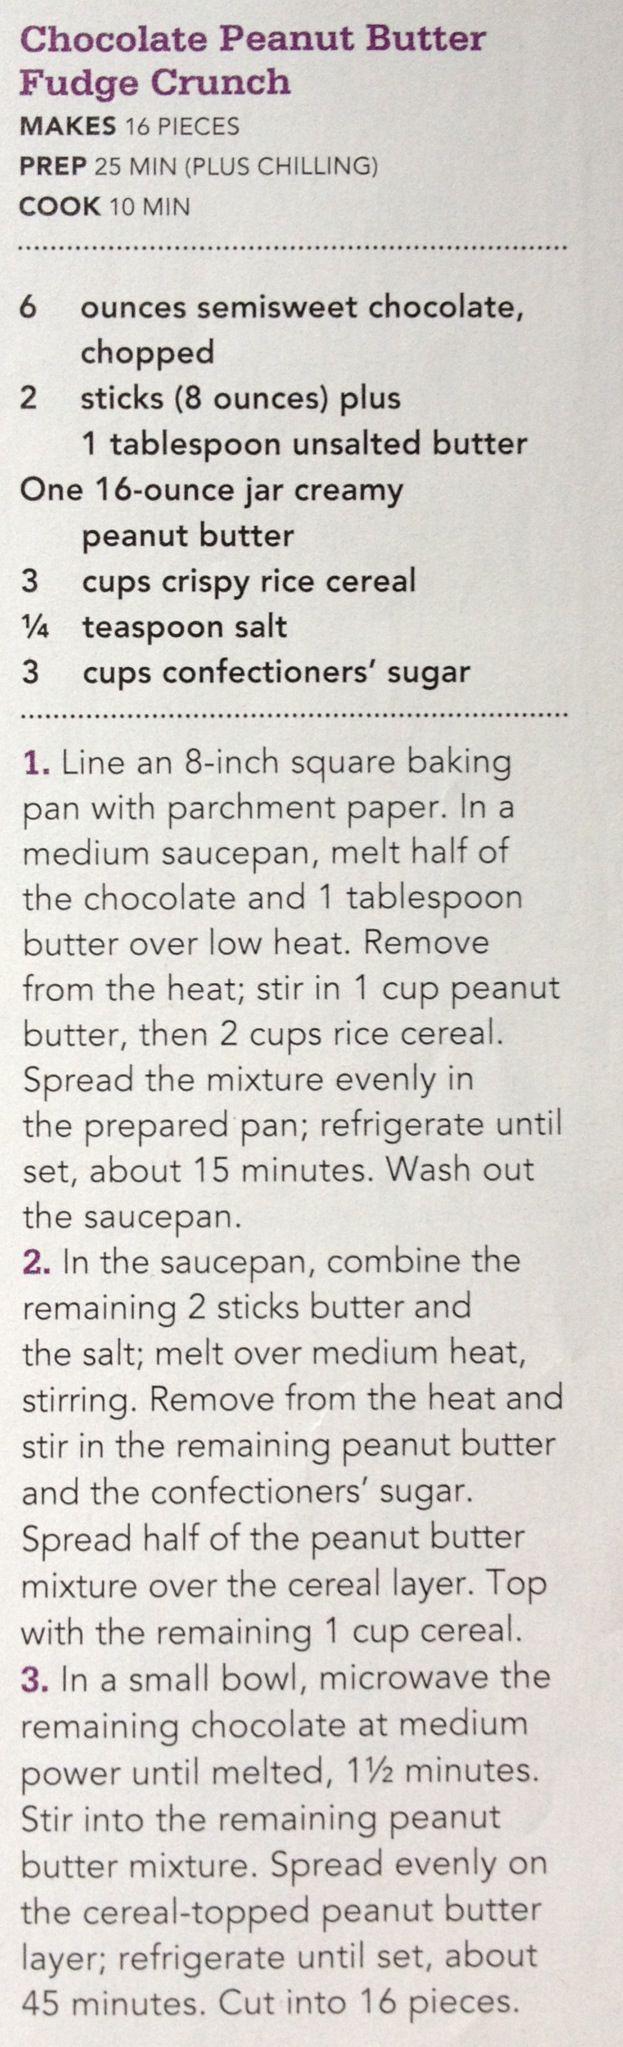 Chocolate Peanut Butter Fudge Crunch | Recipes - Desserts | Pinterest